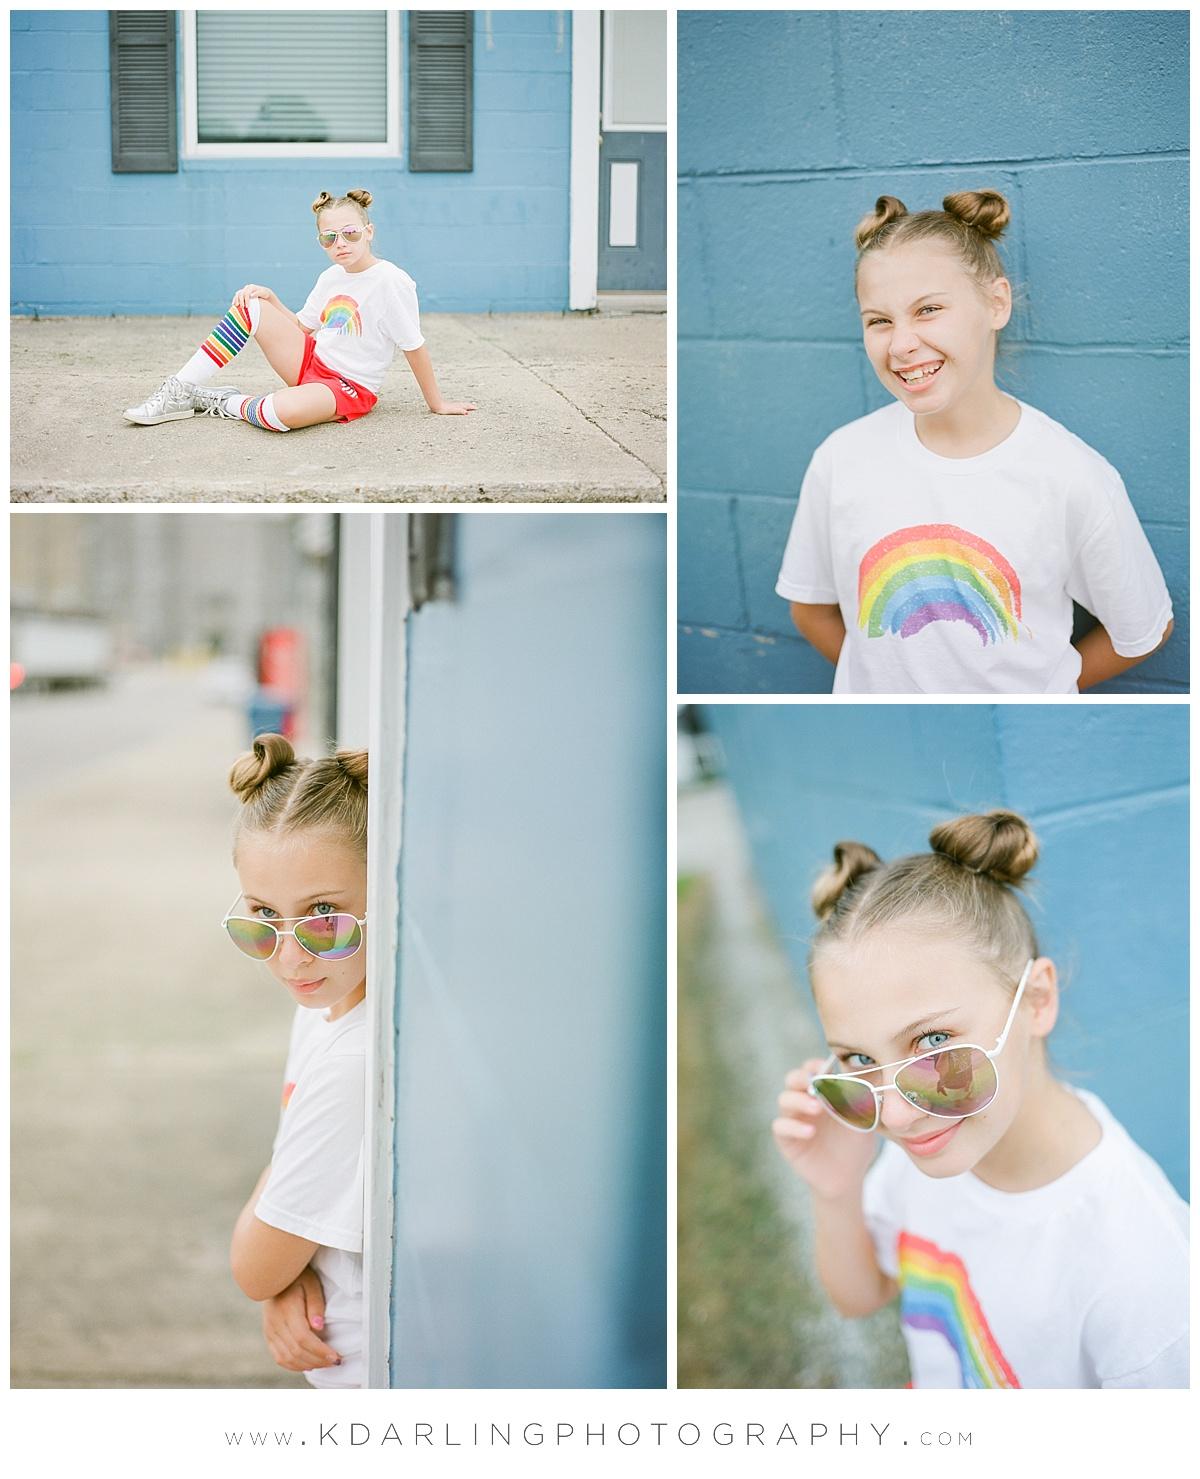 Central-illinois-Photographer-child-film-photography-Champaign-mamiya-fuji-rainbow-back-to-school-session_0436.jpg